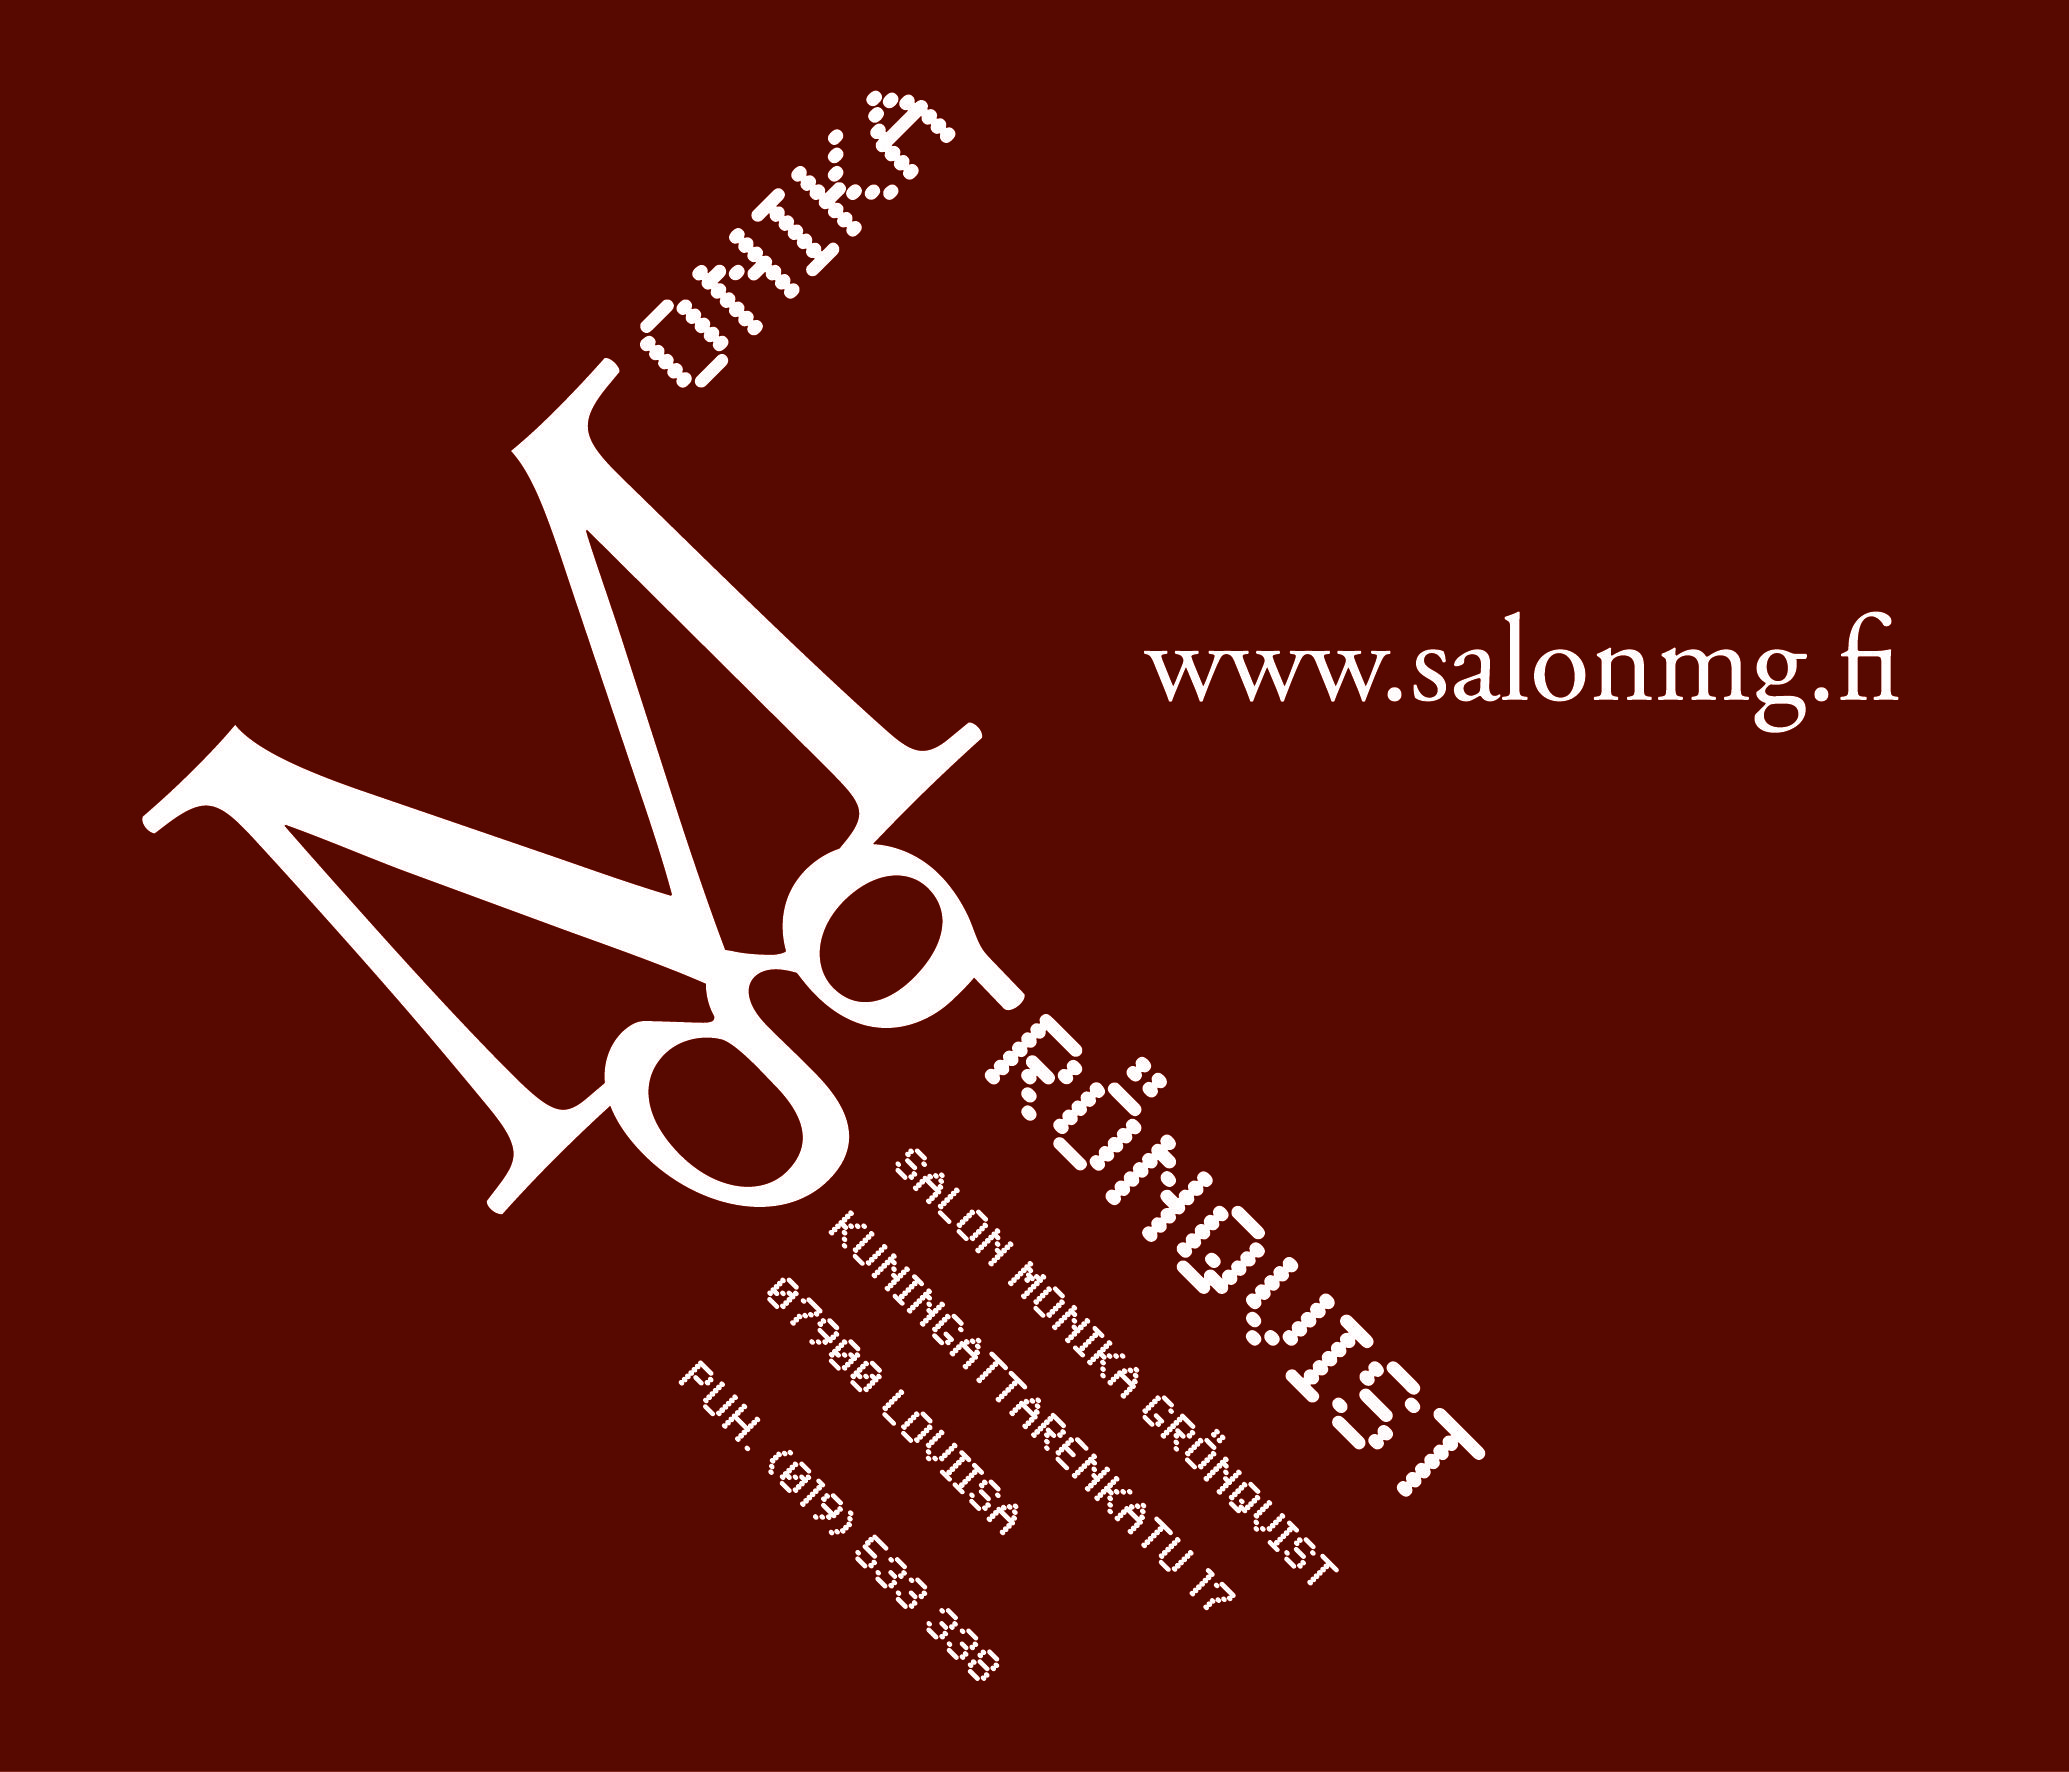 Freelancer-projekti: Salon Monika Grönqvist. Logon suunnittelu. © Natasha Design Tmi, 2010. – http://www.salonmg.fi/